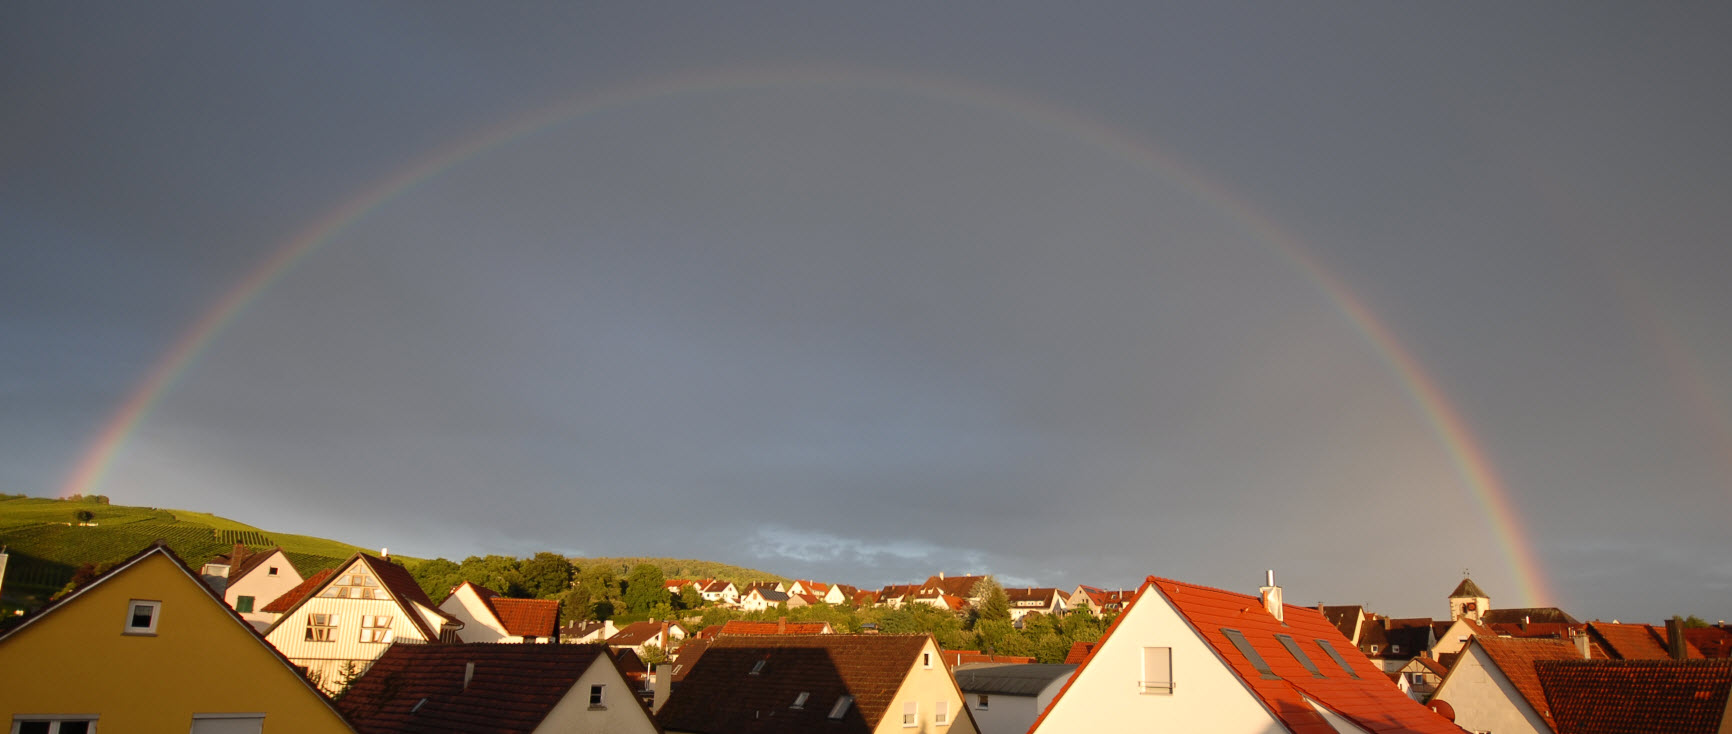 Sommer Regenbogen